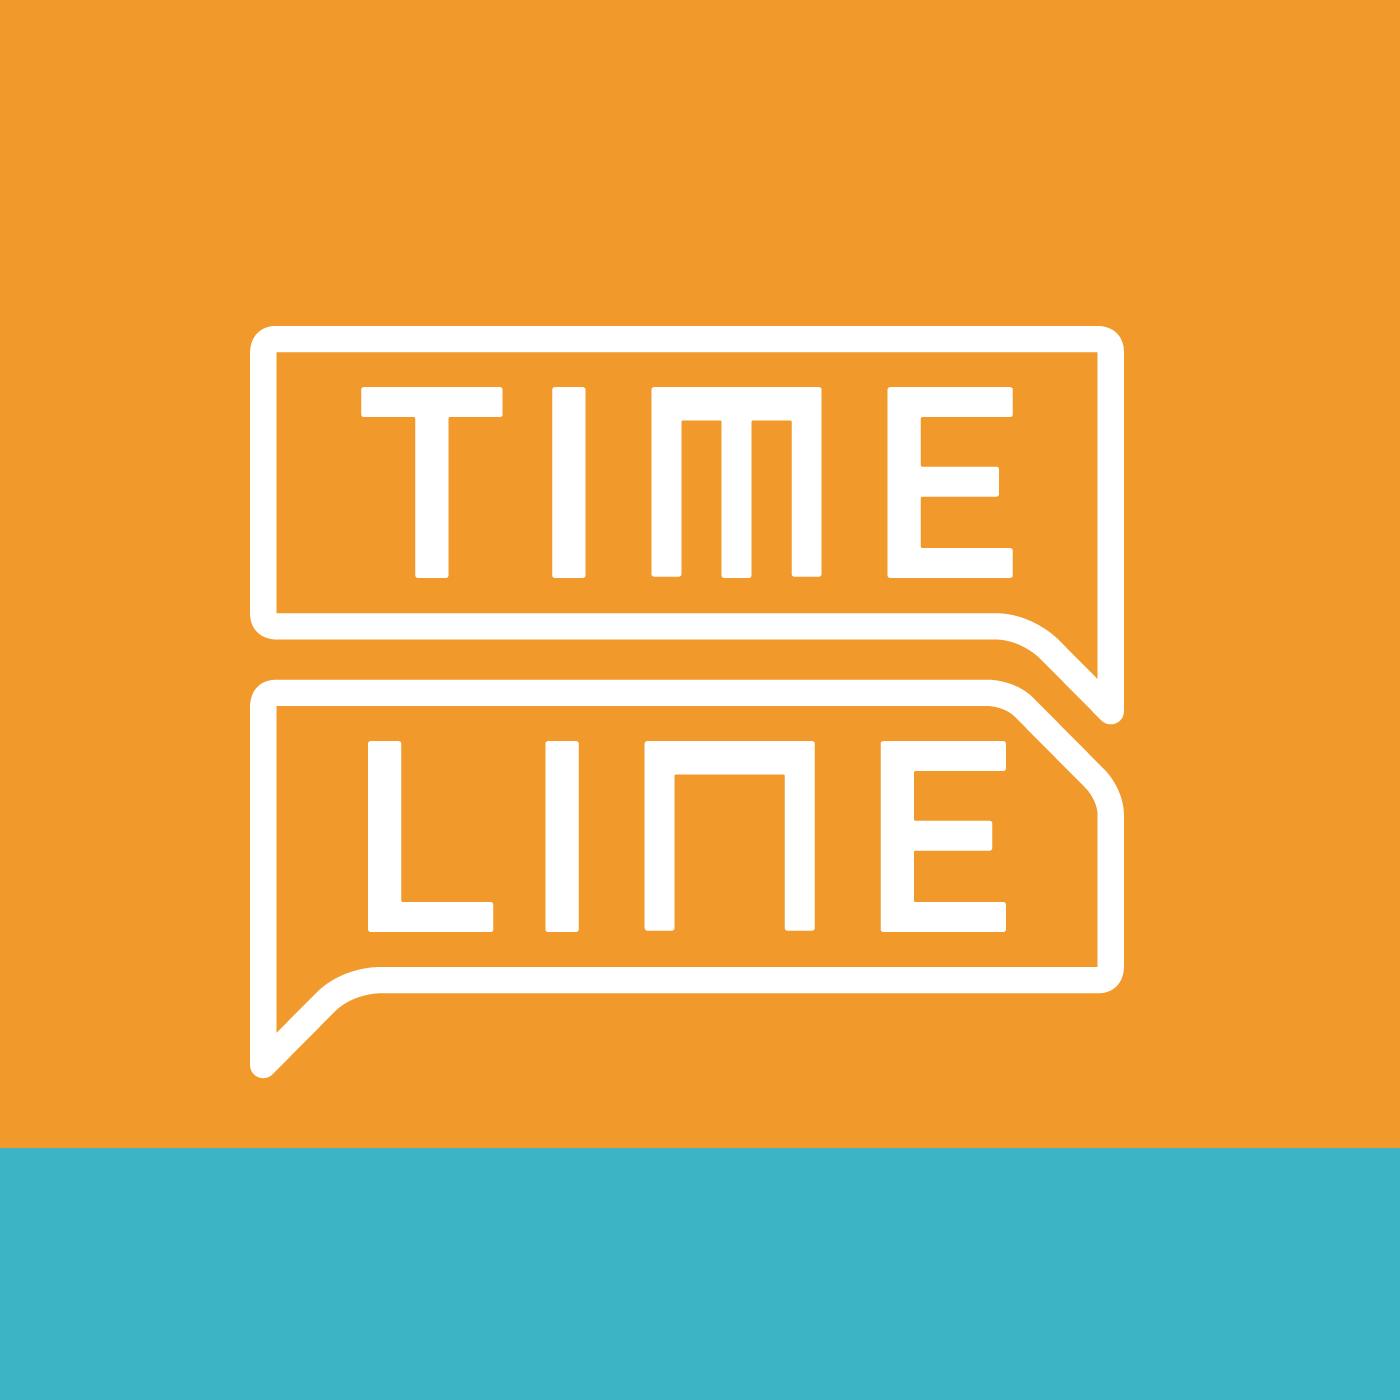 Timeline Gaúcha 14.03.2018